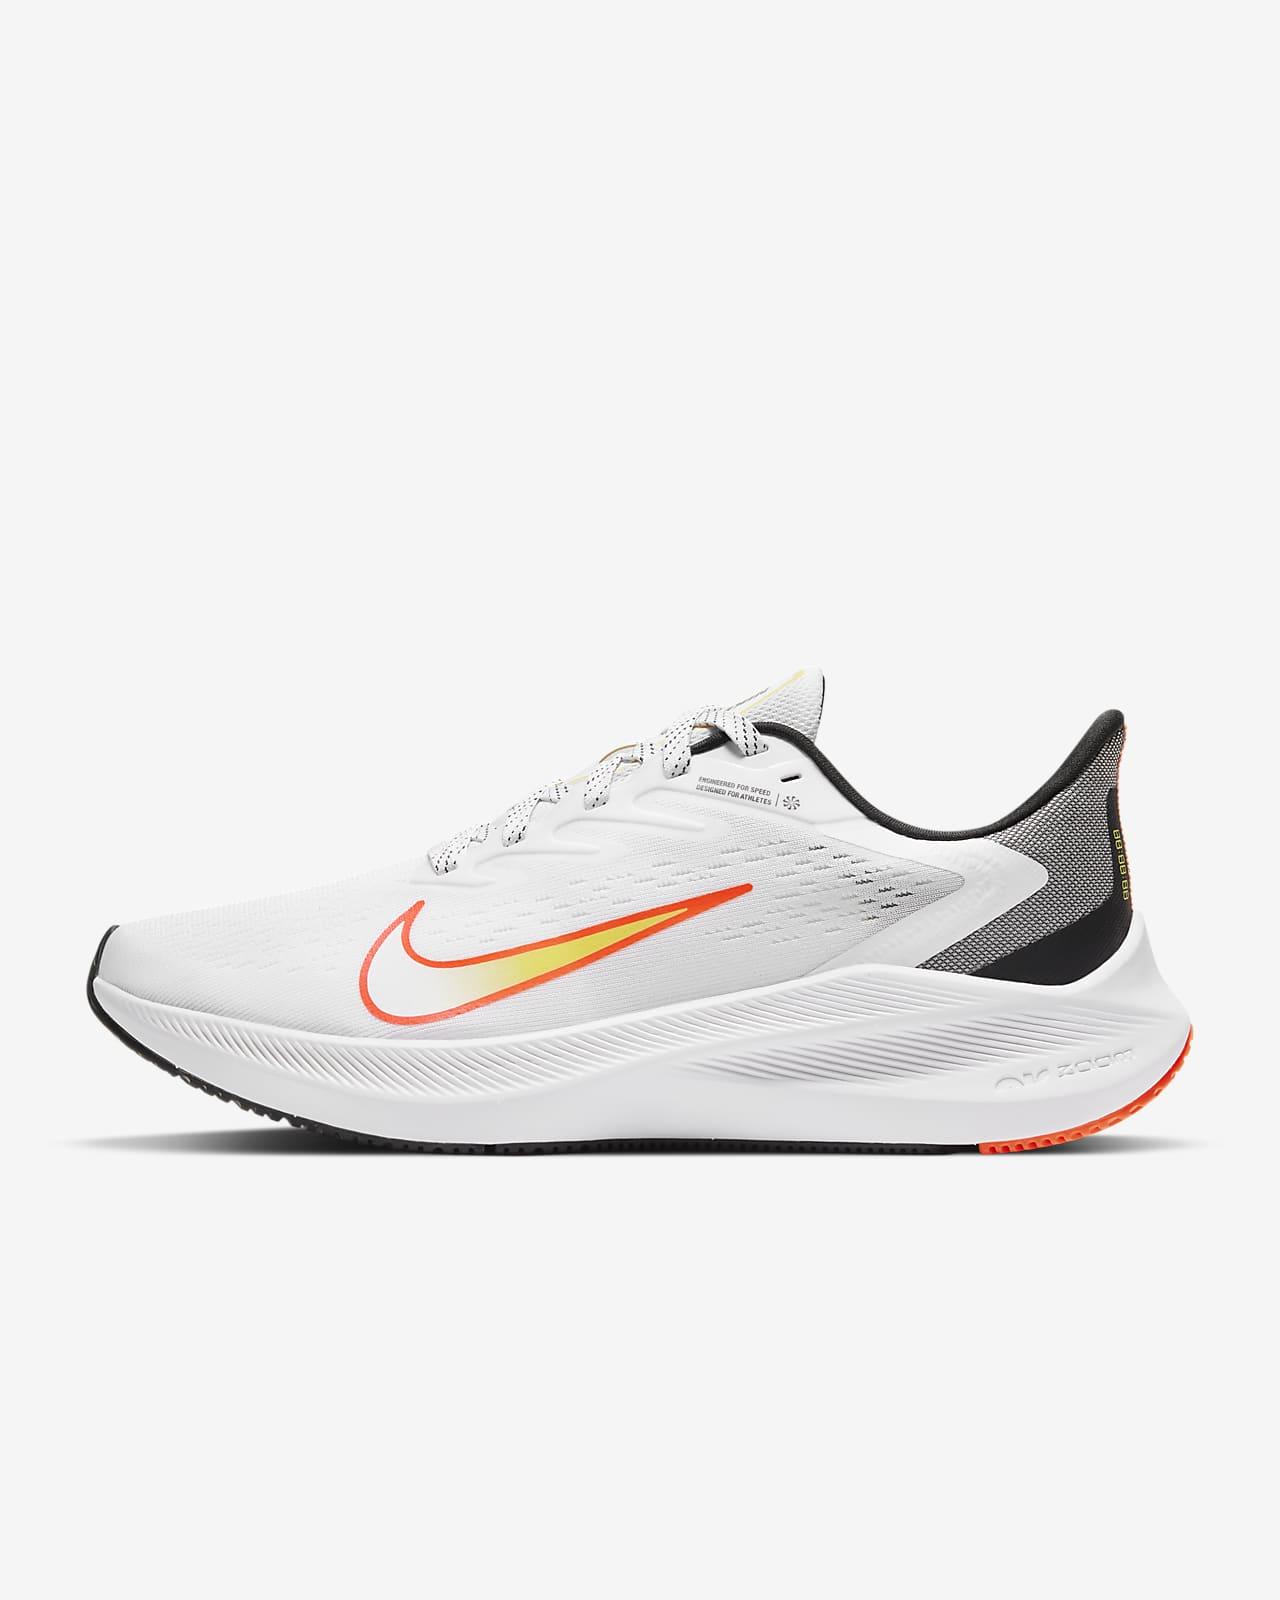 Calzado de running para mujer Nike Air Zoom Winflo 7